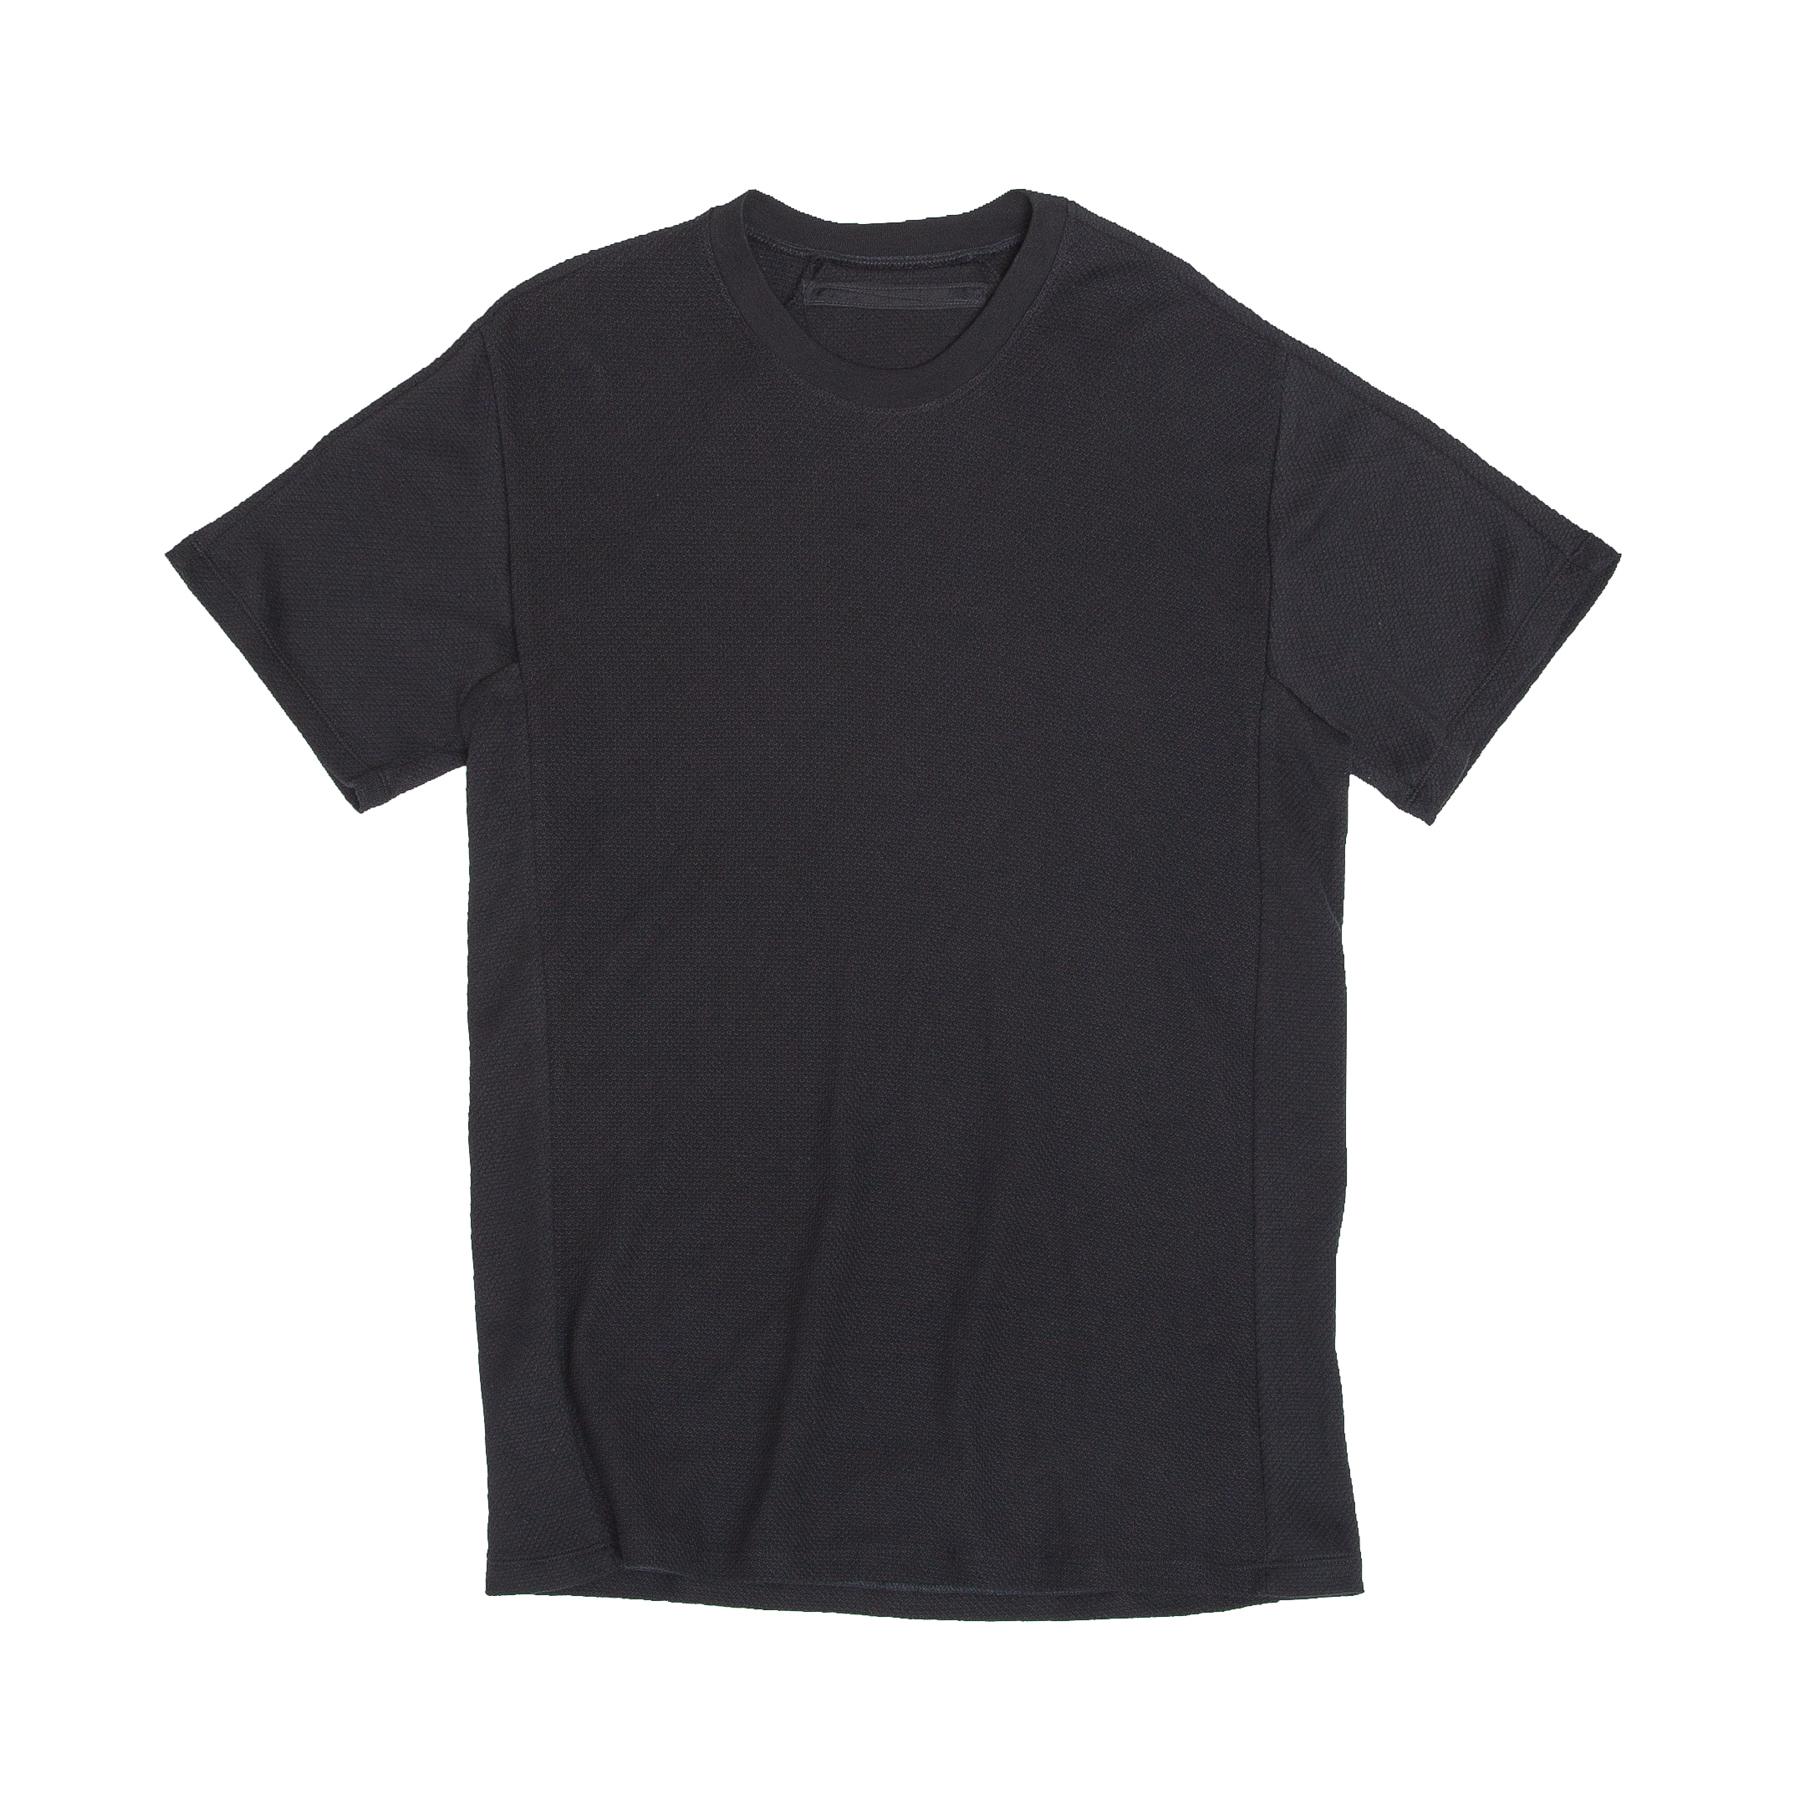 620CUM8-BLACK / クルーネックT-シャツ ver.1